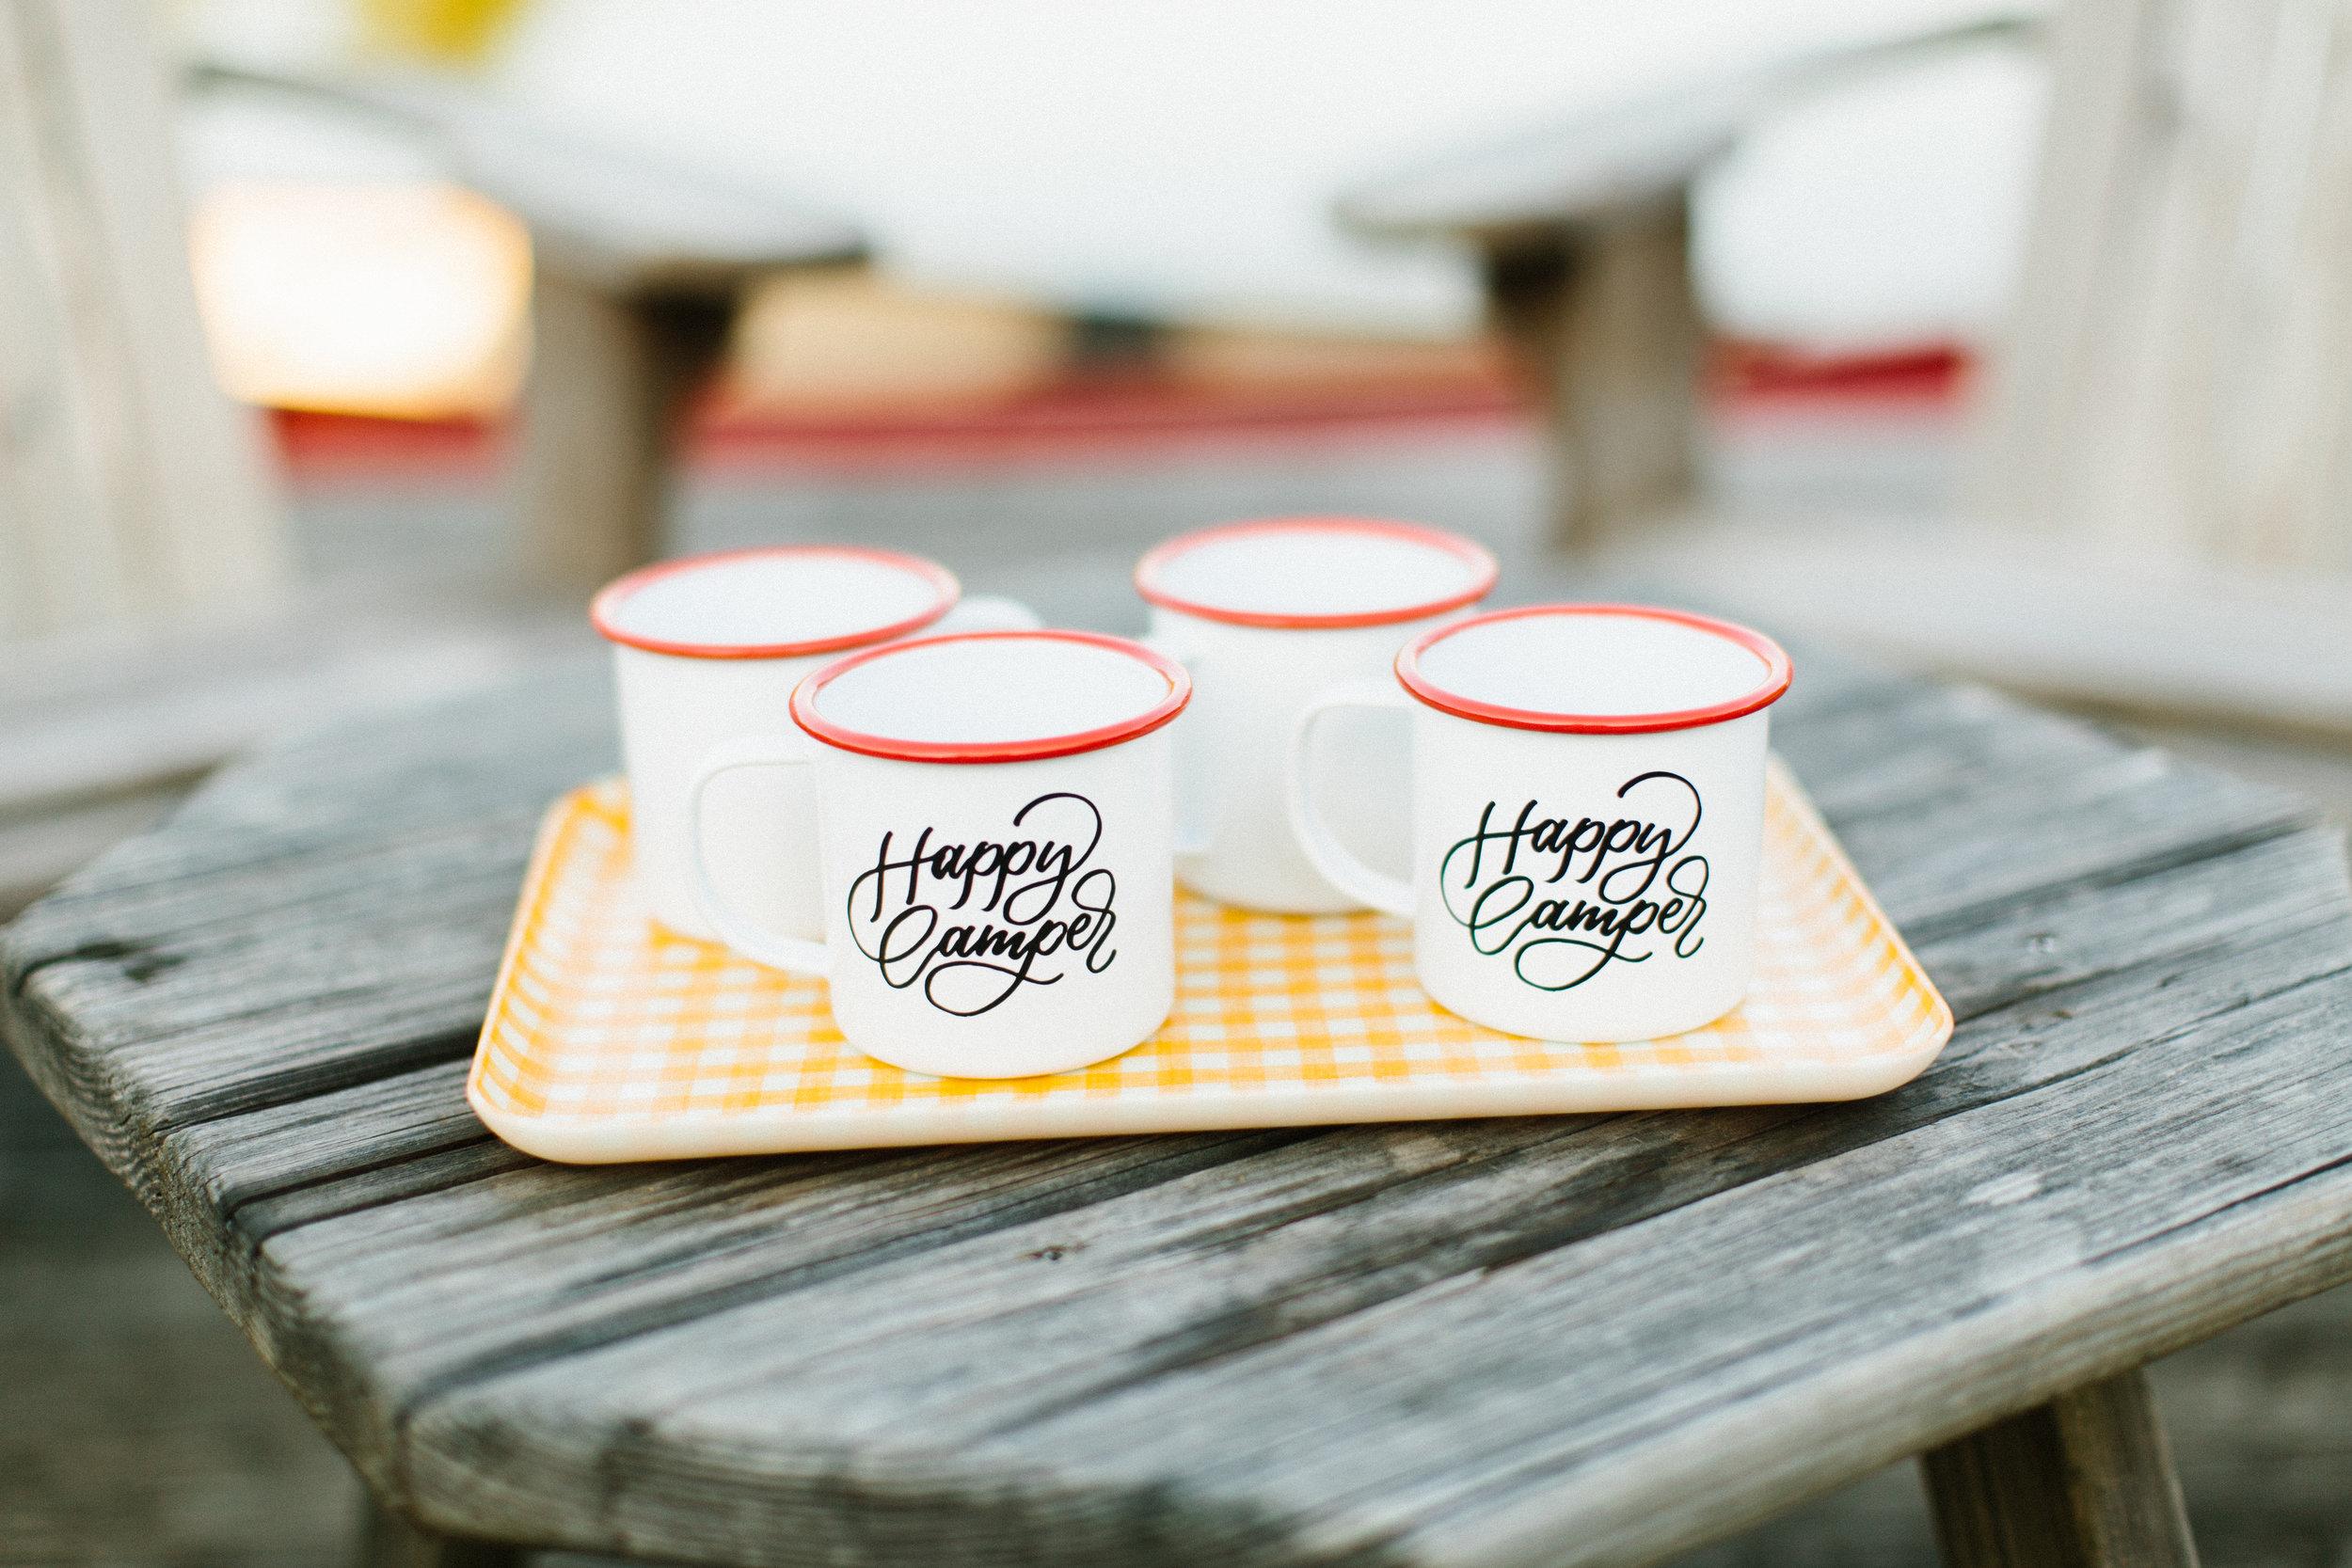 Happy Campers Wedding-inspiration at Lake House at Bulow